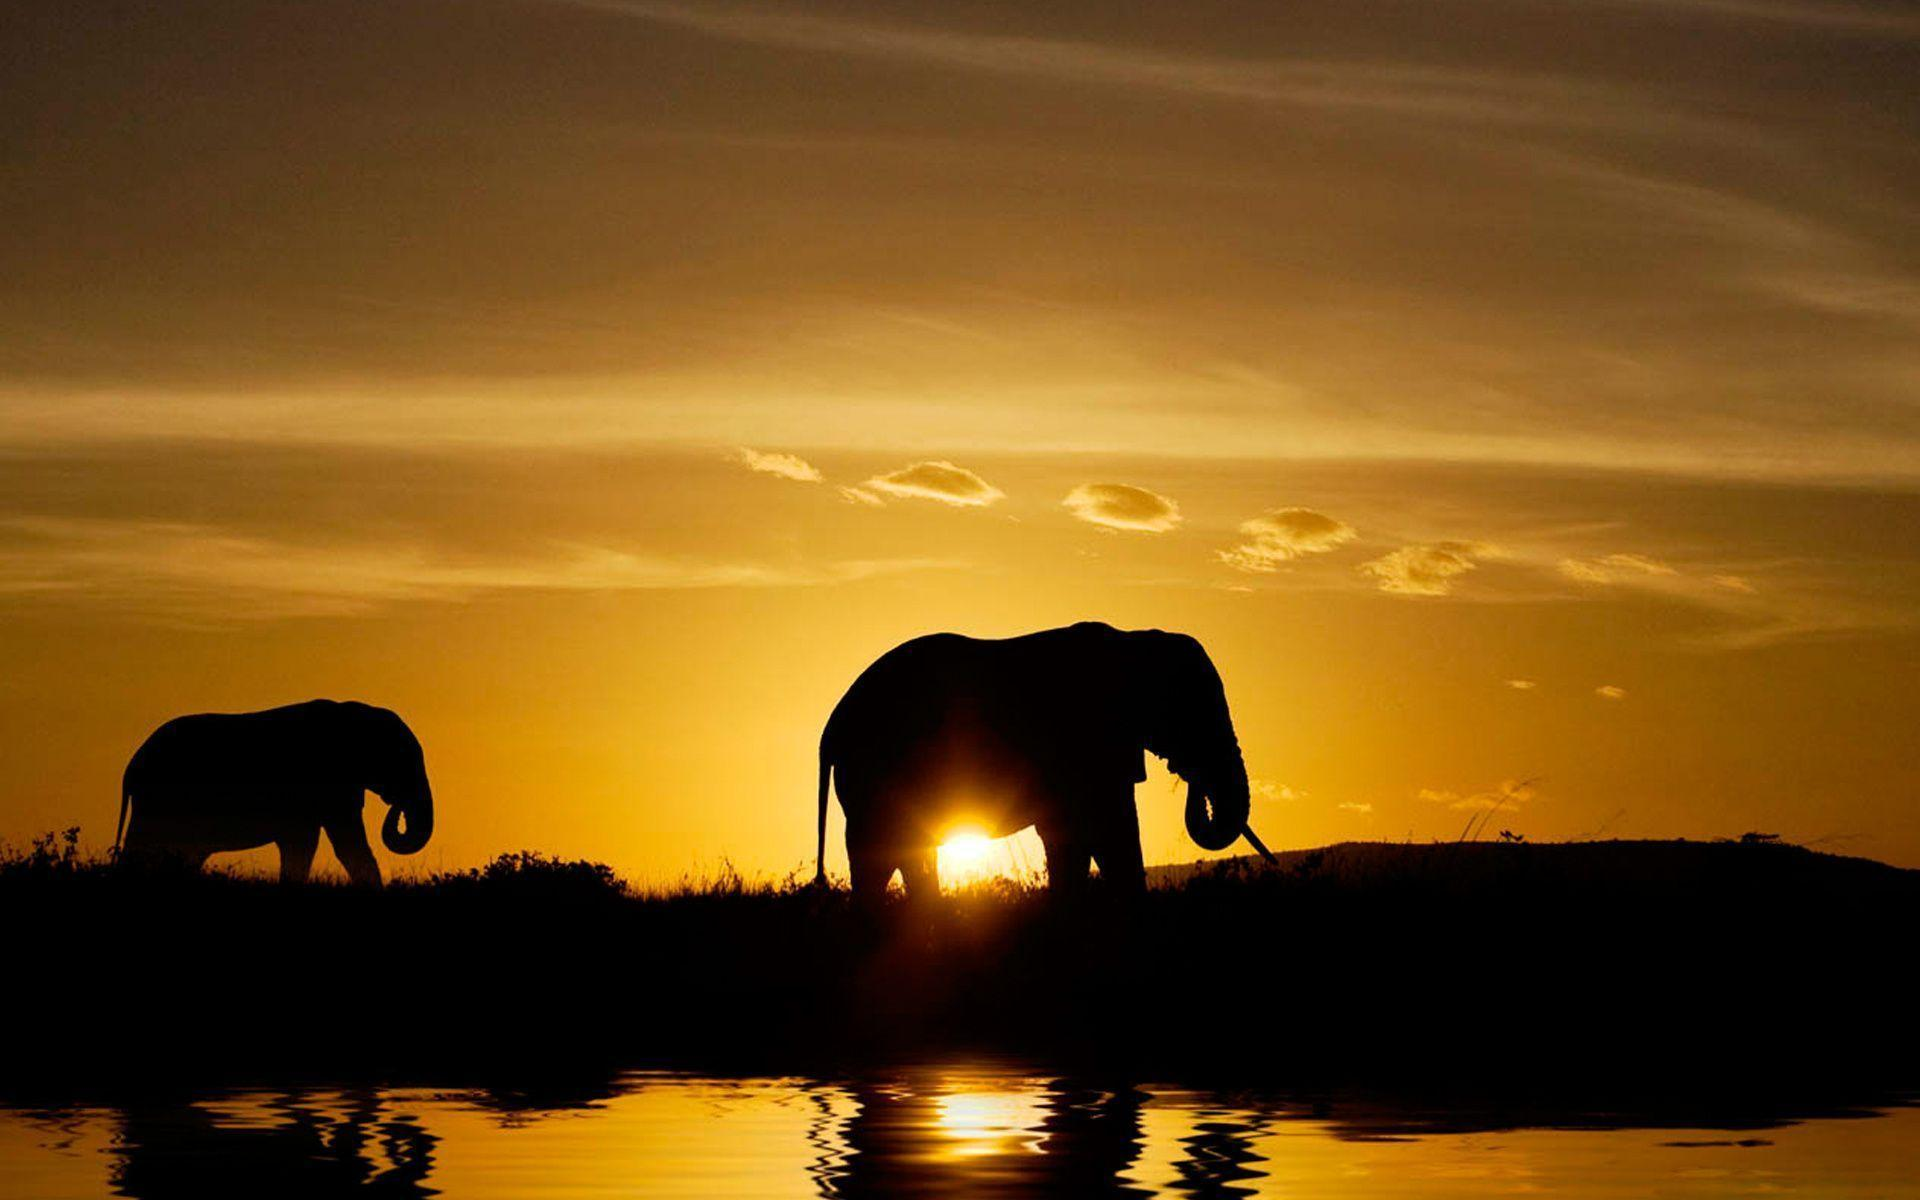 Wild Animals Safari Images Wallpaper - Animal Powericare.